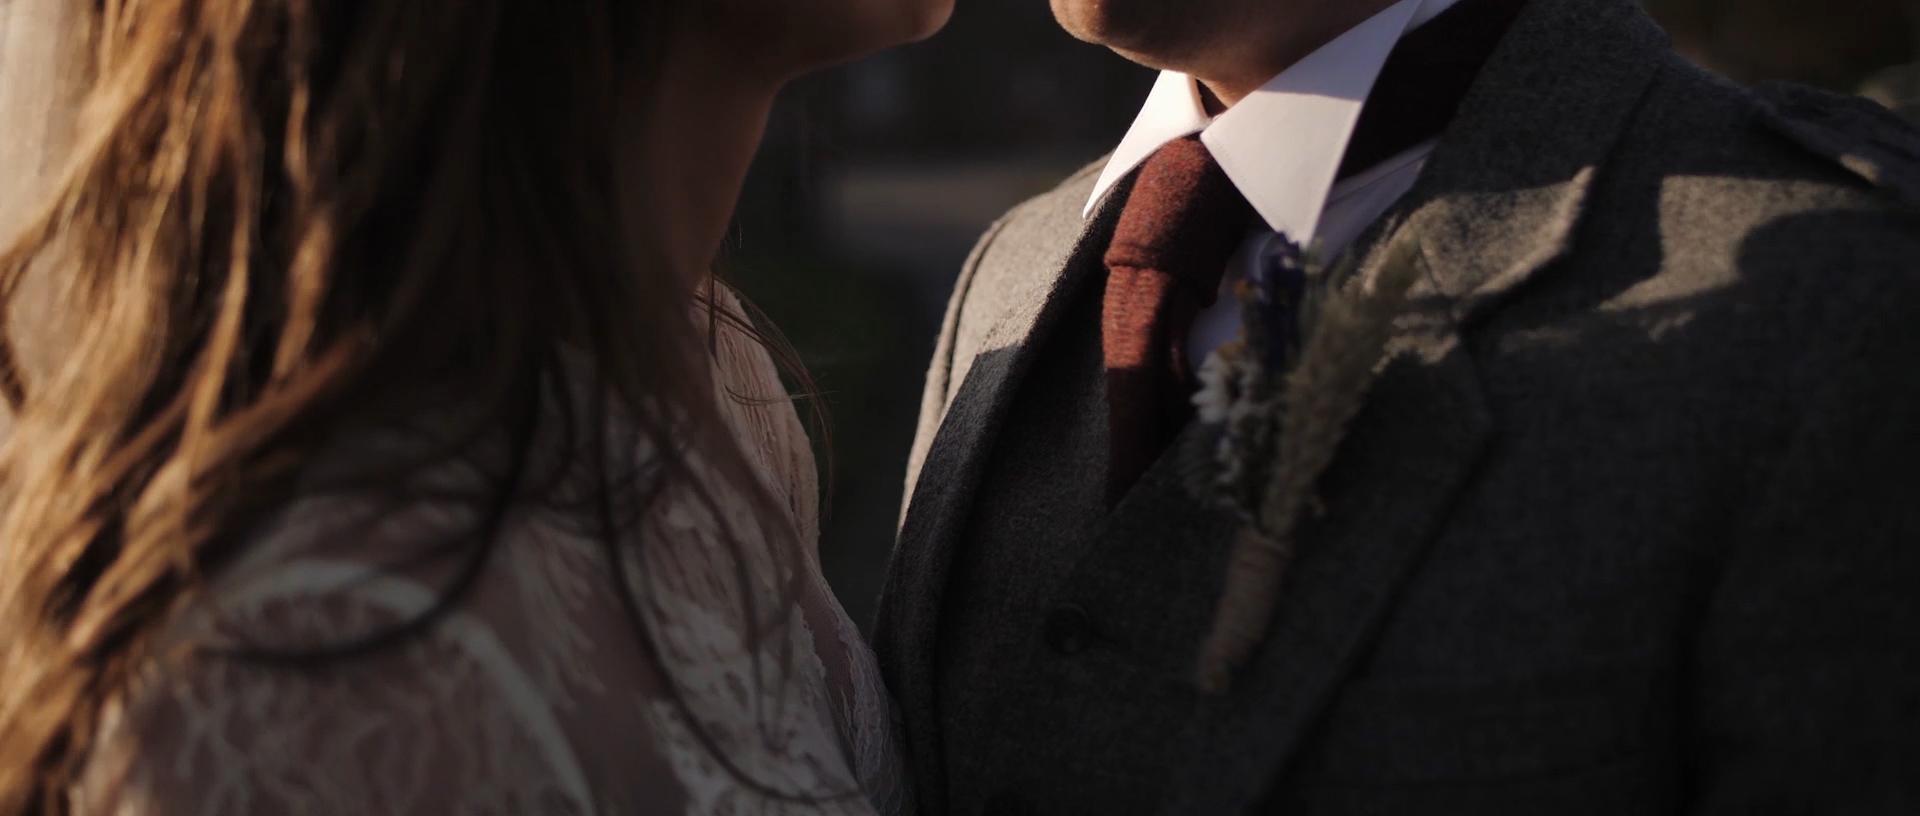 comrie-croft-wedding-videographer_LL_04.jpg